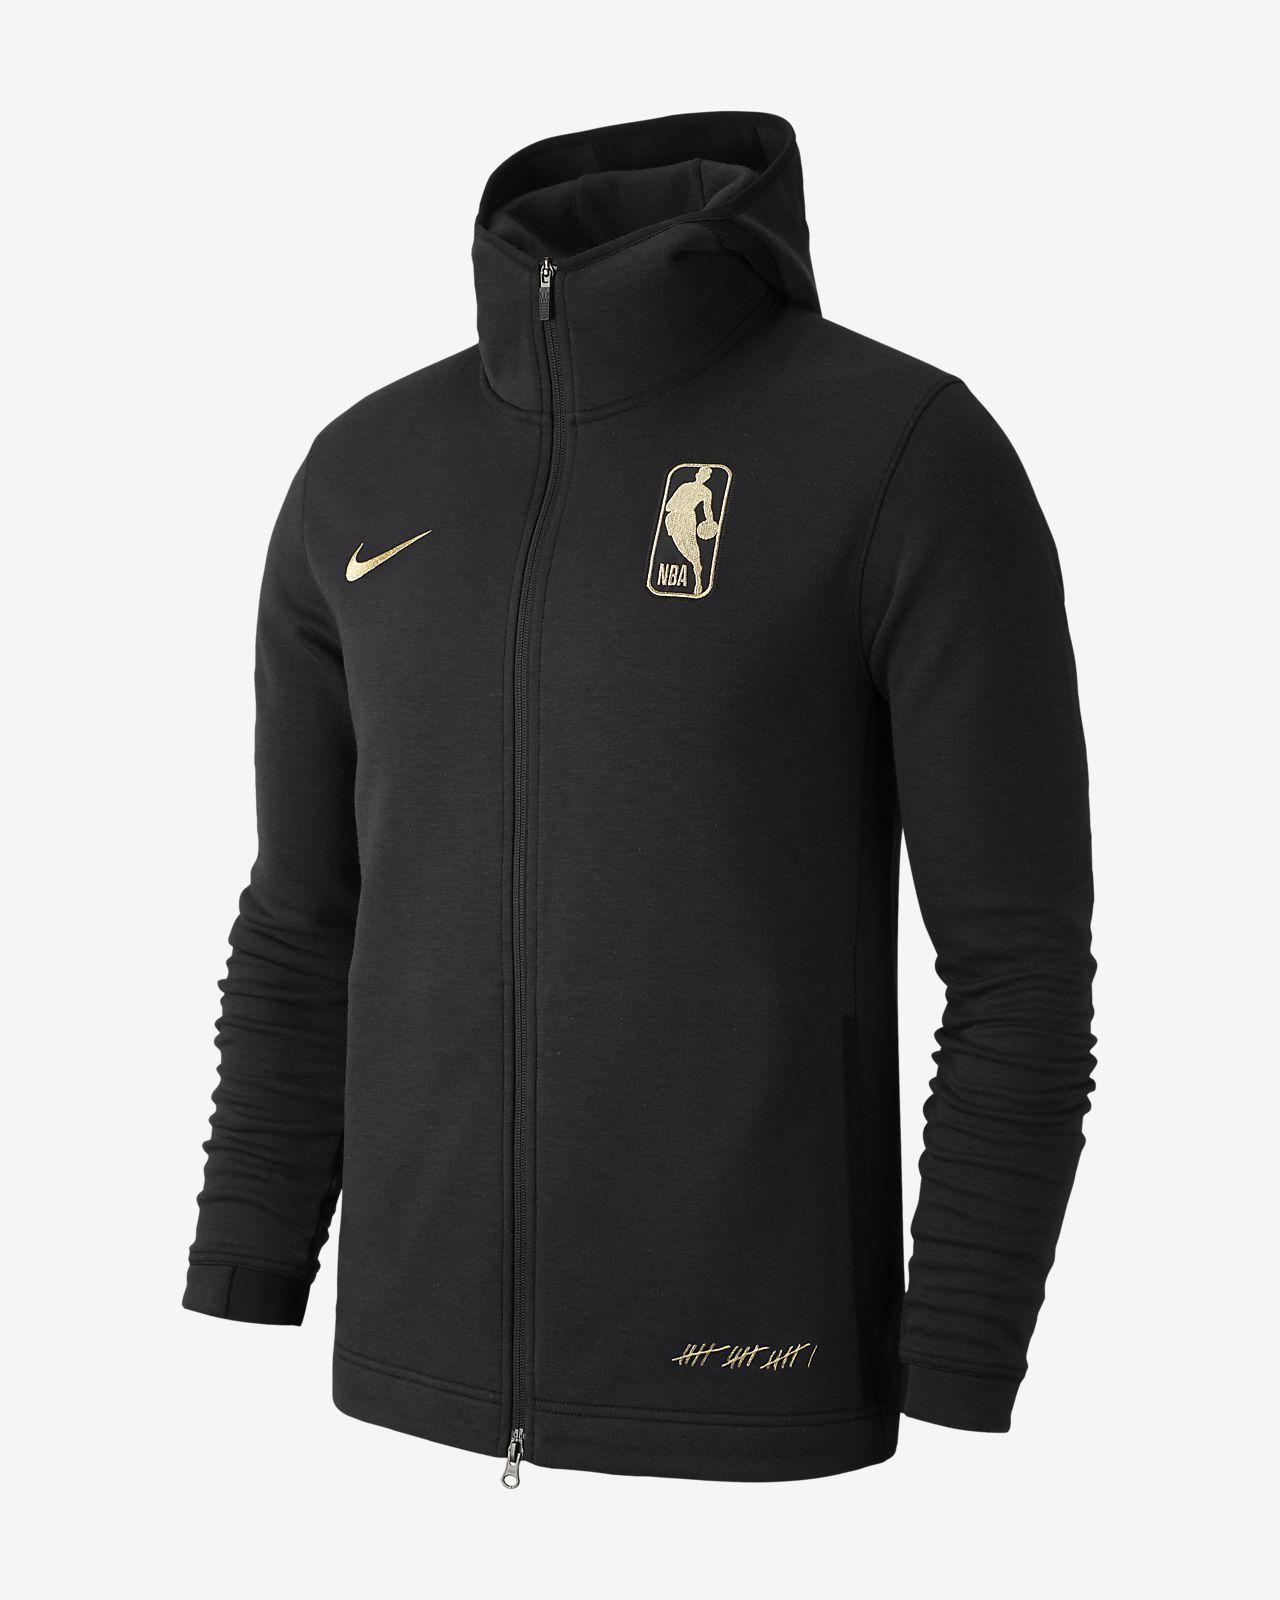 b0cb9818 Nike Dri-FIT Showtime Association Men's Full-Zip NBA Hoodie | S.F. ...